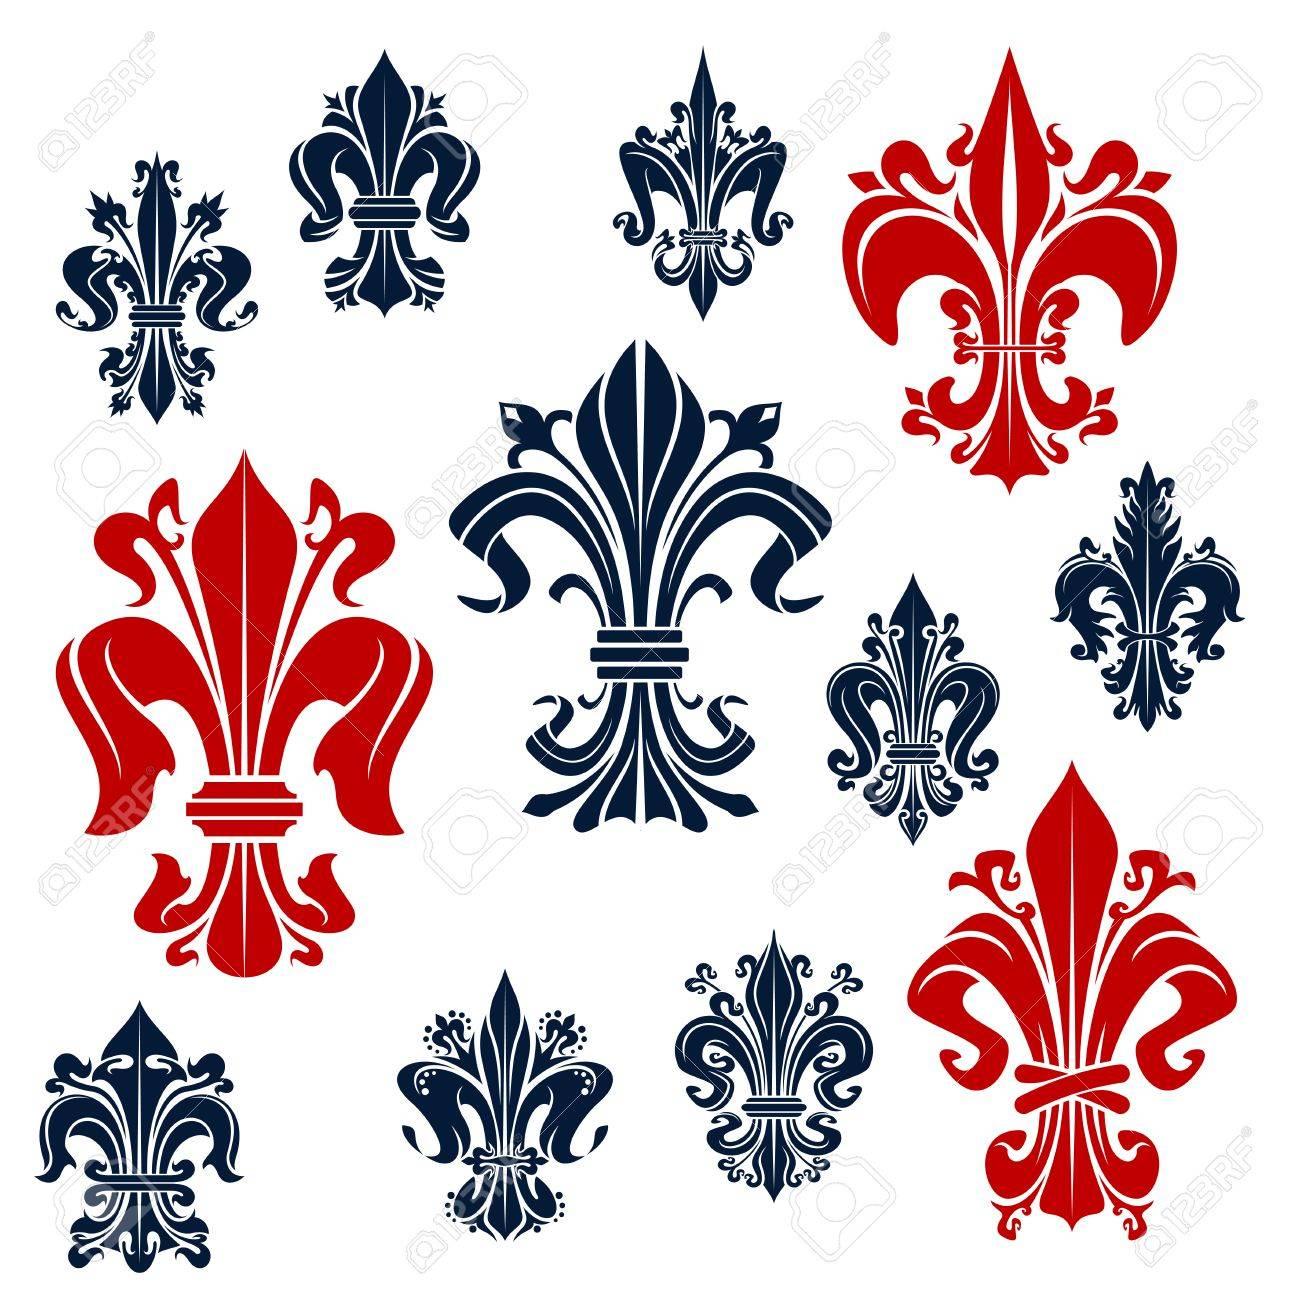 Royal French Heraldry Design Elements For Coat Of Arms Emblem